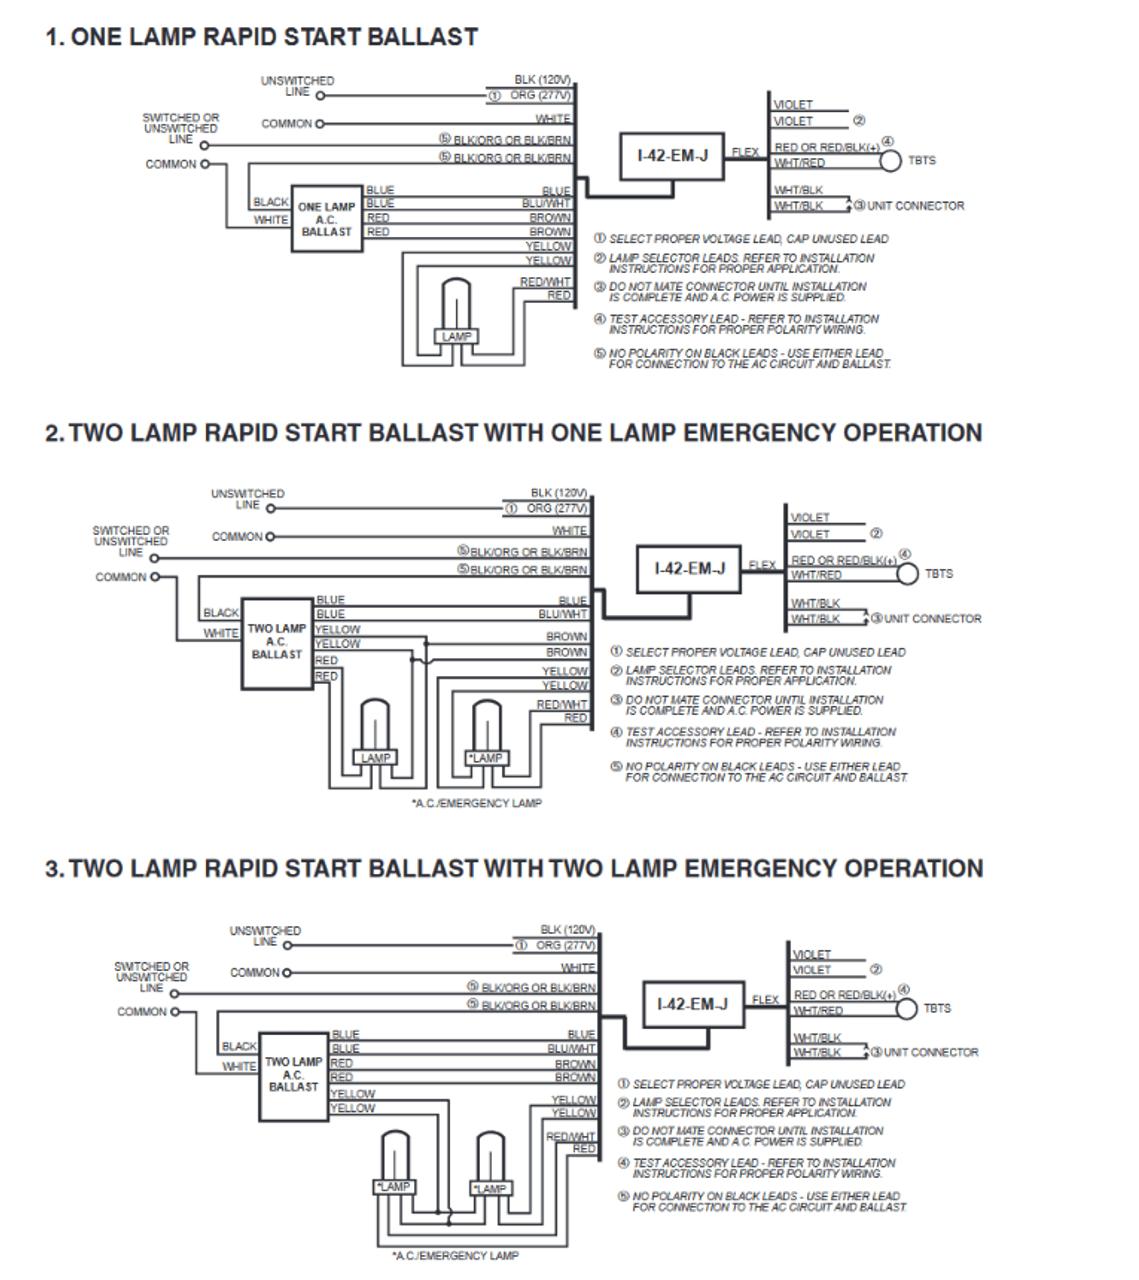 lamp rapid start ballast wiring diagram on rapid start ballast wiring t12 to t8 advance  [ 1139 x 1280 Pixel ]